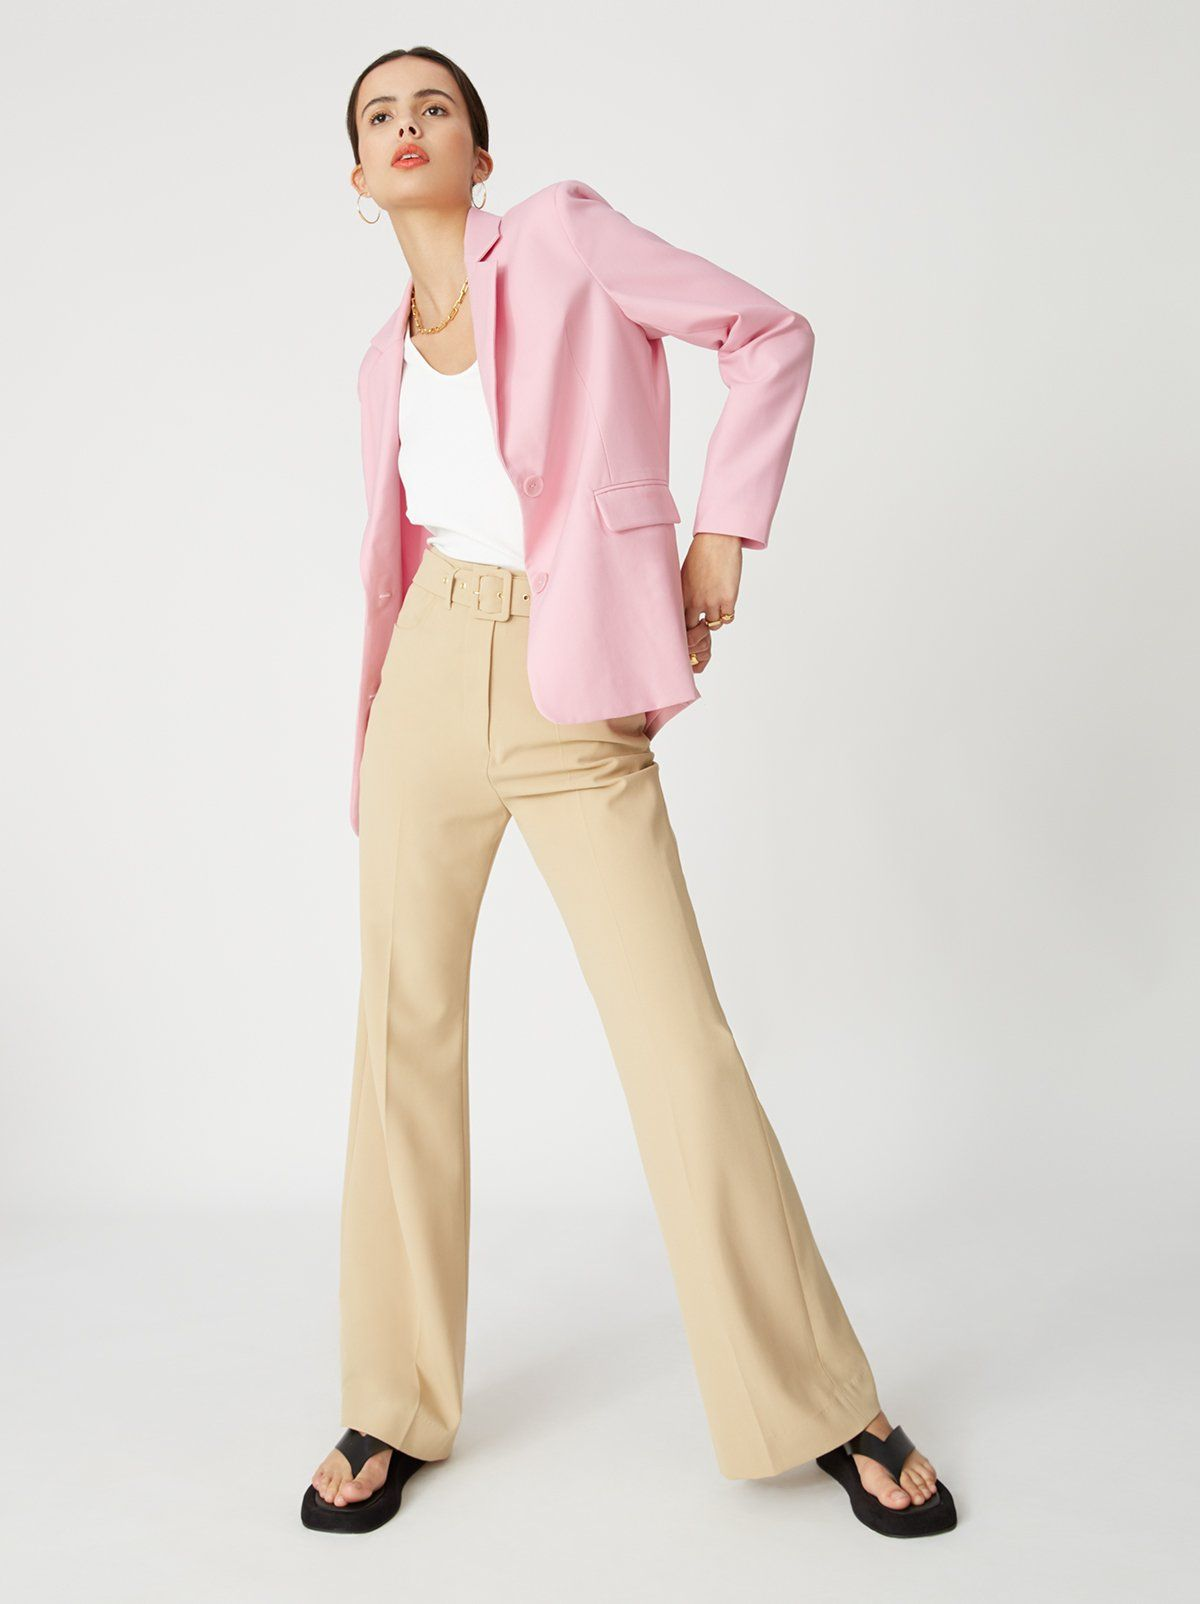 Laurie Pink Oversized Tailored Blazer | Women's Oversized Blazers | KITRI